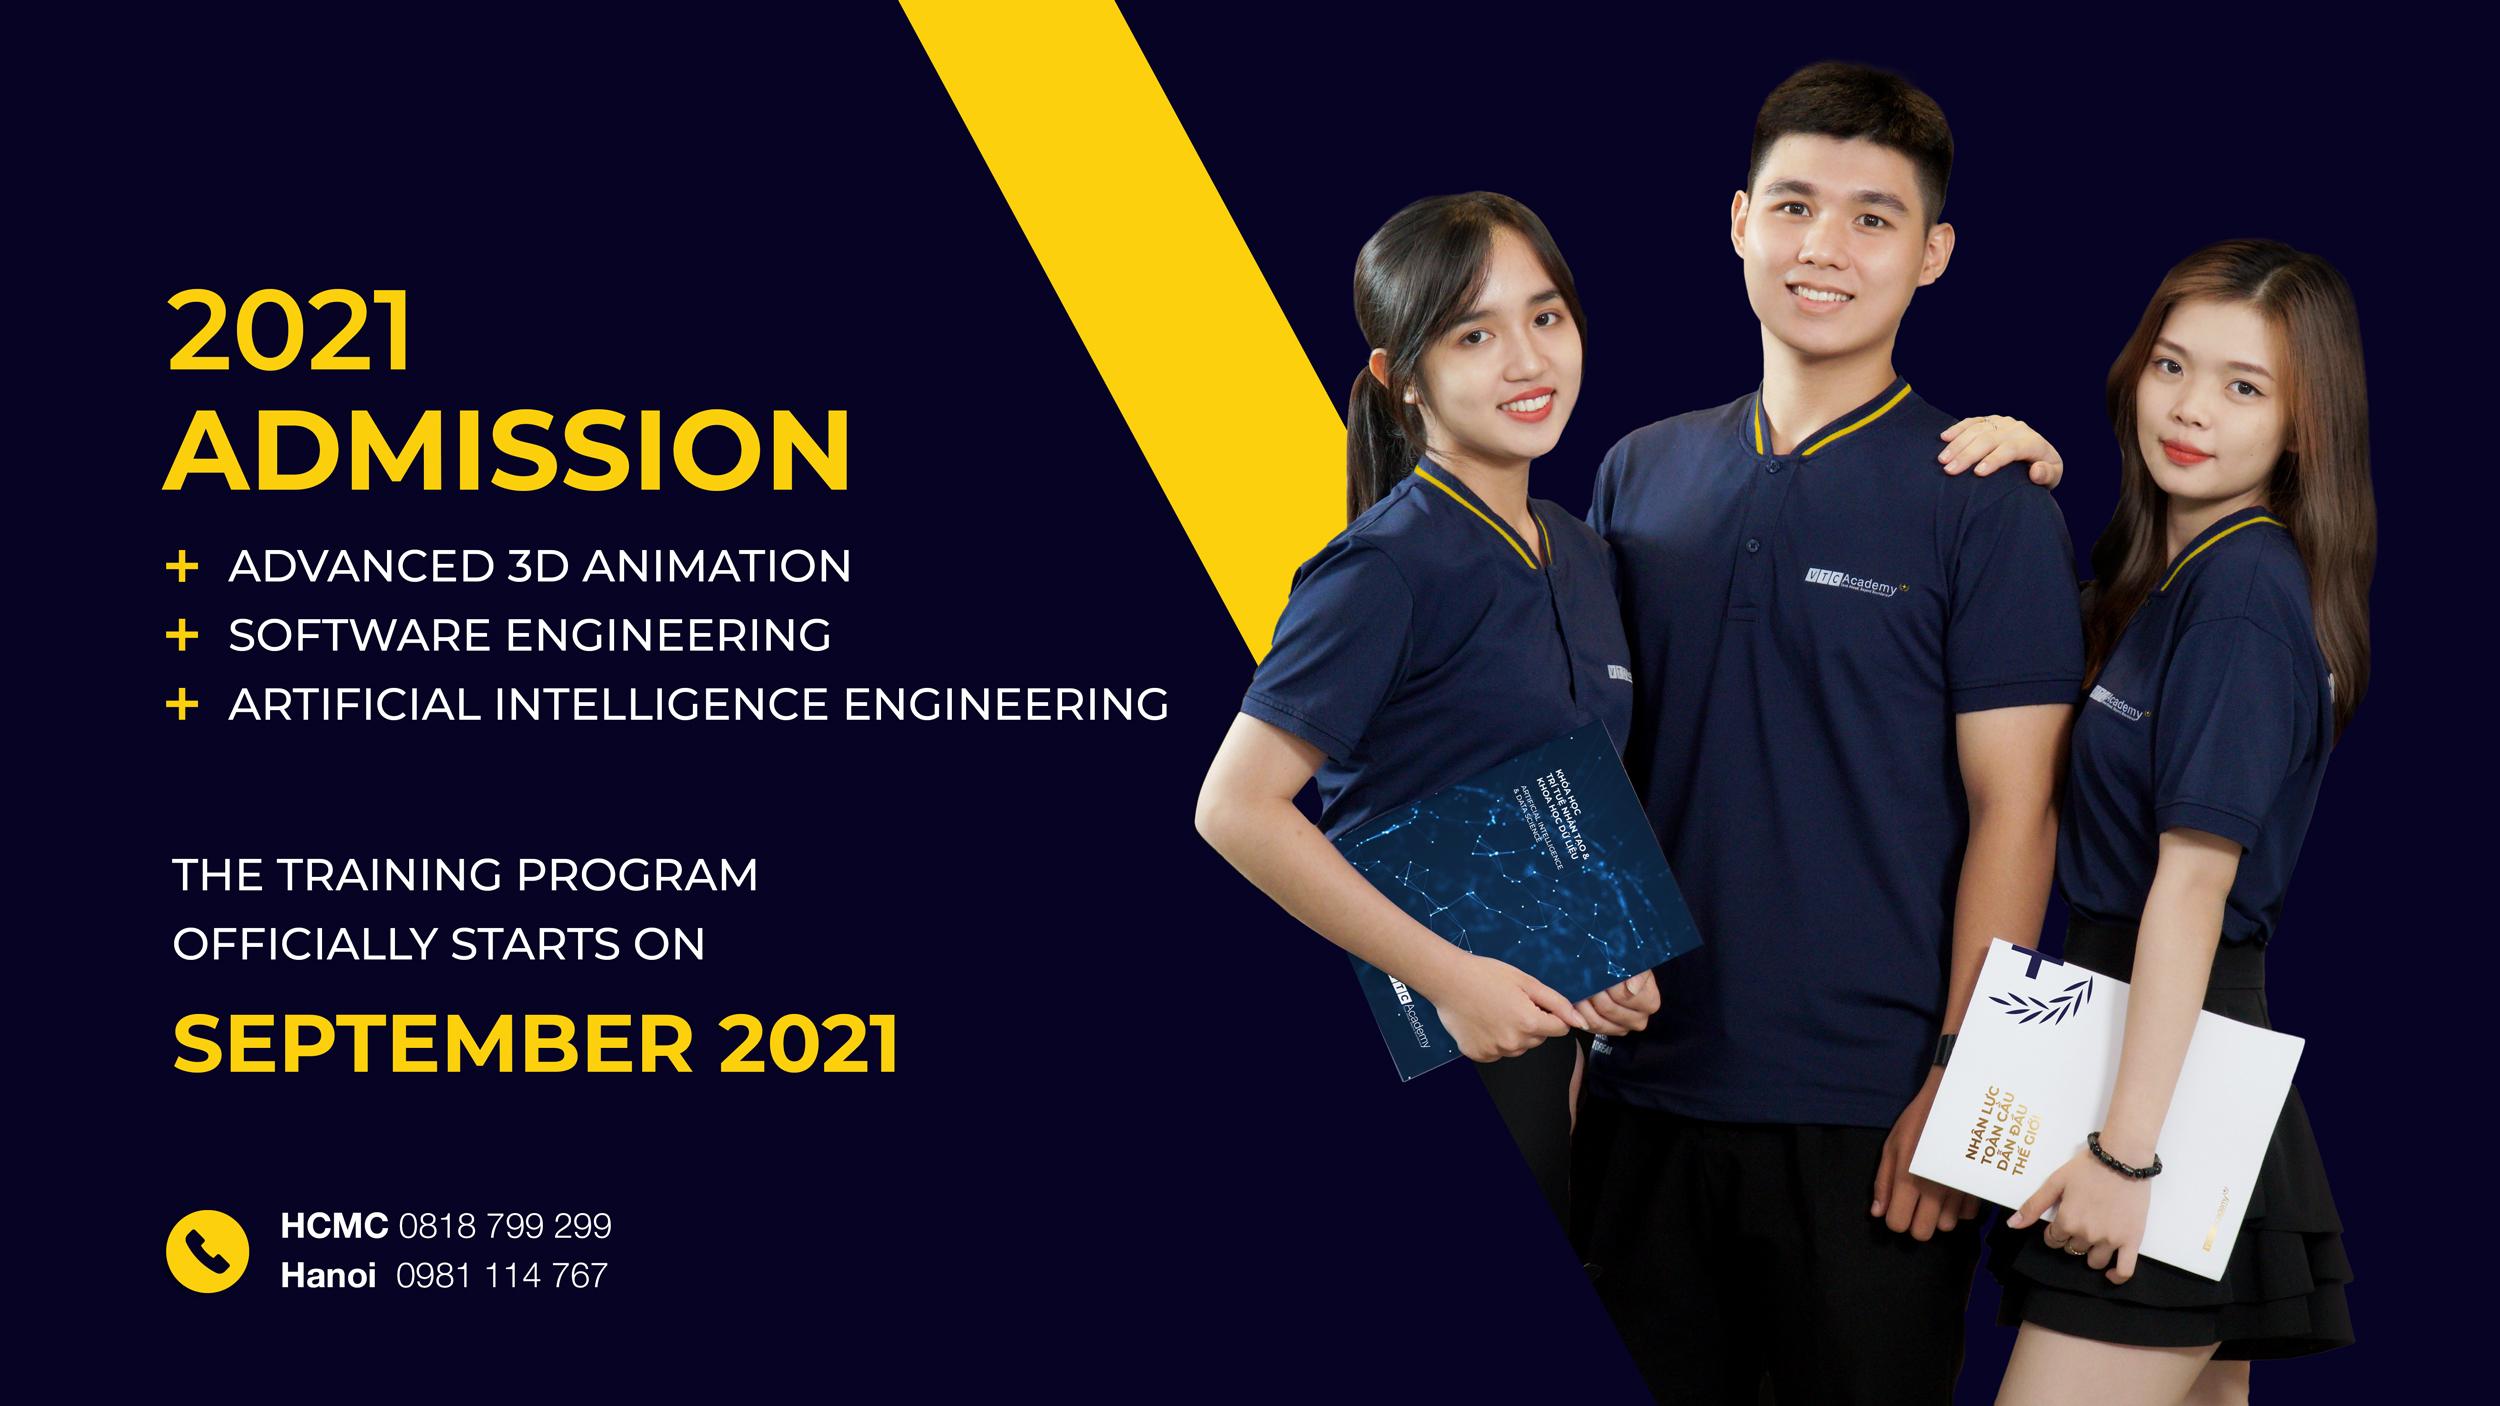 2021 Admission